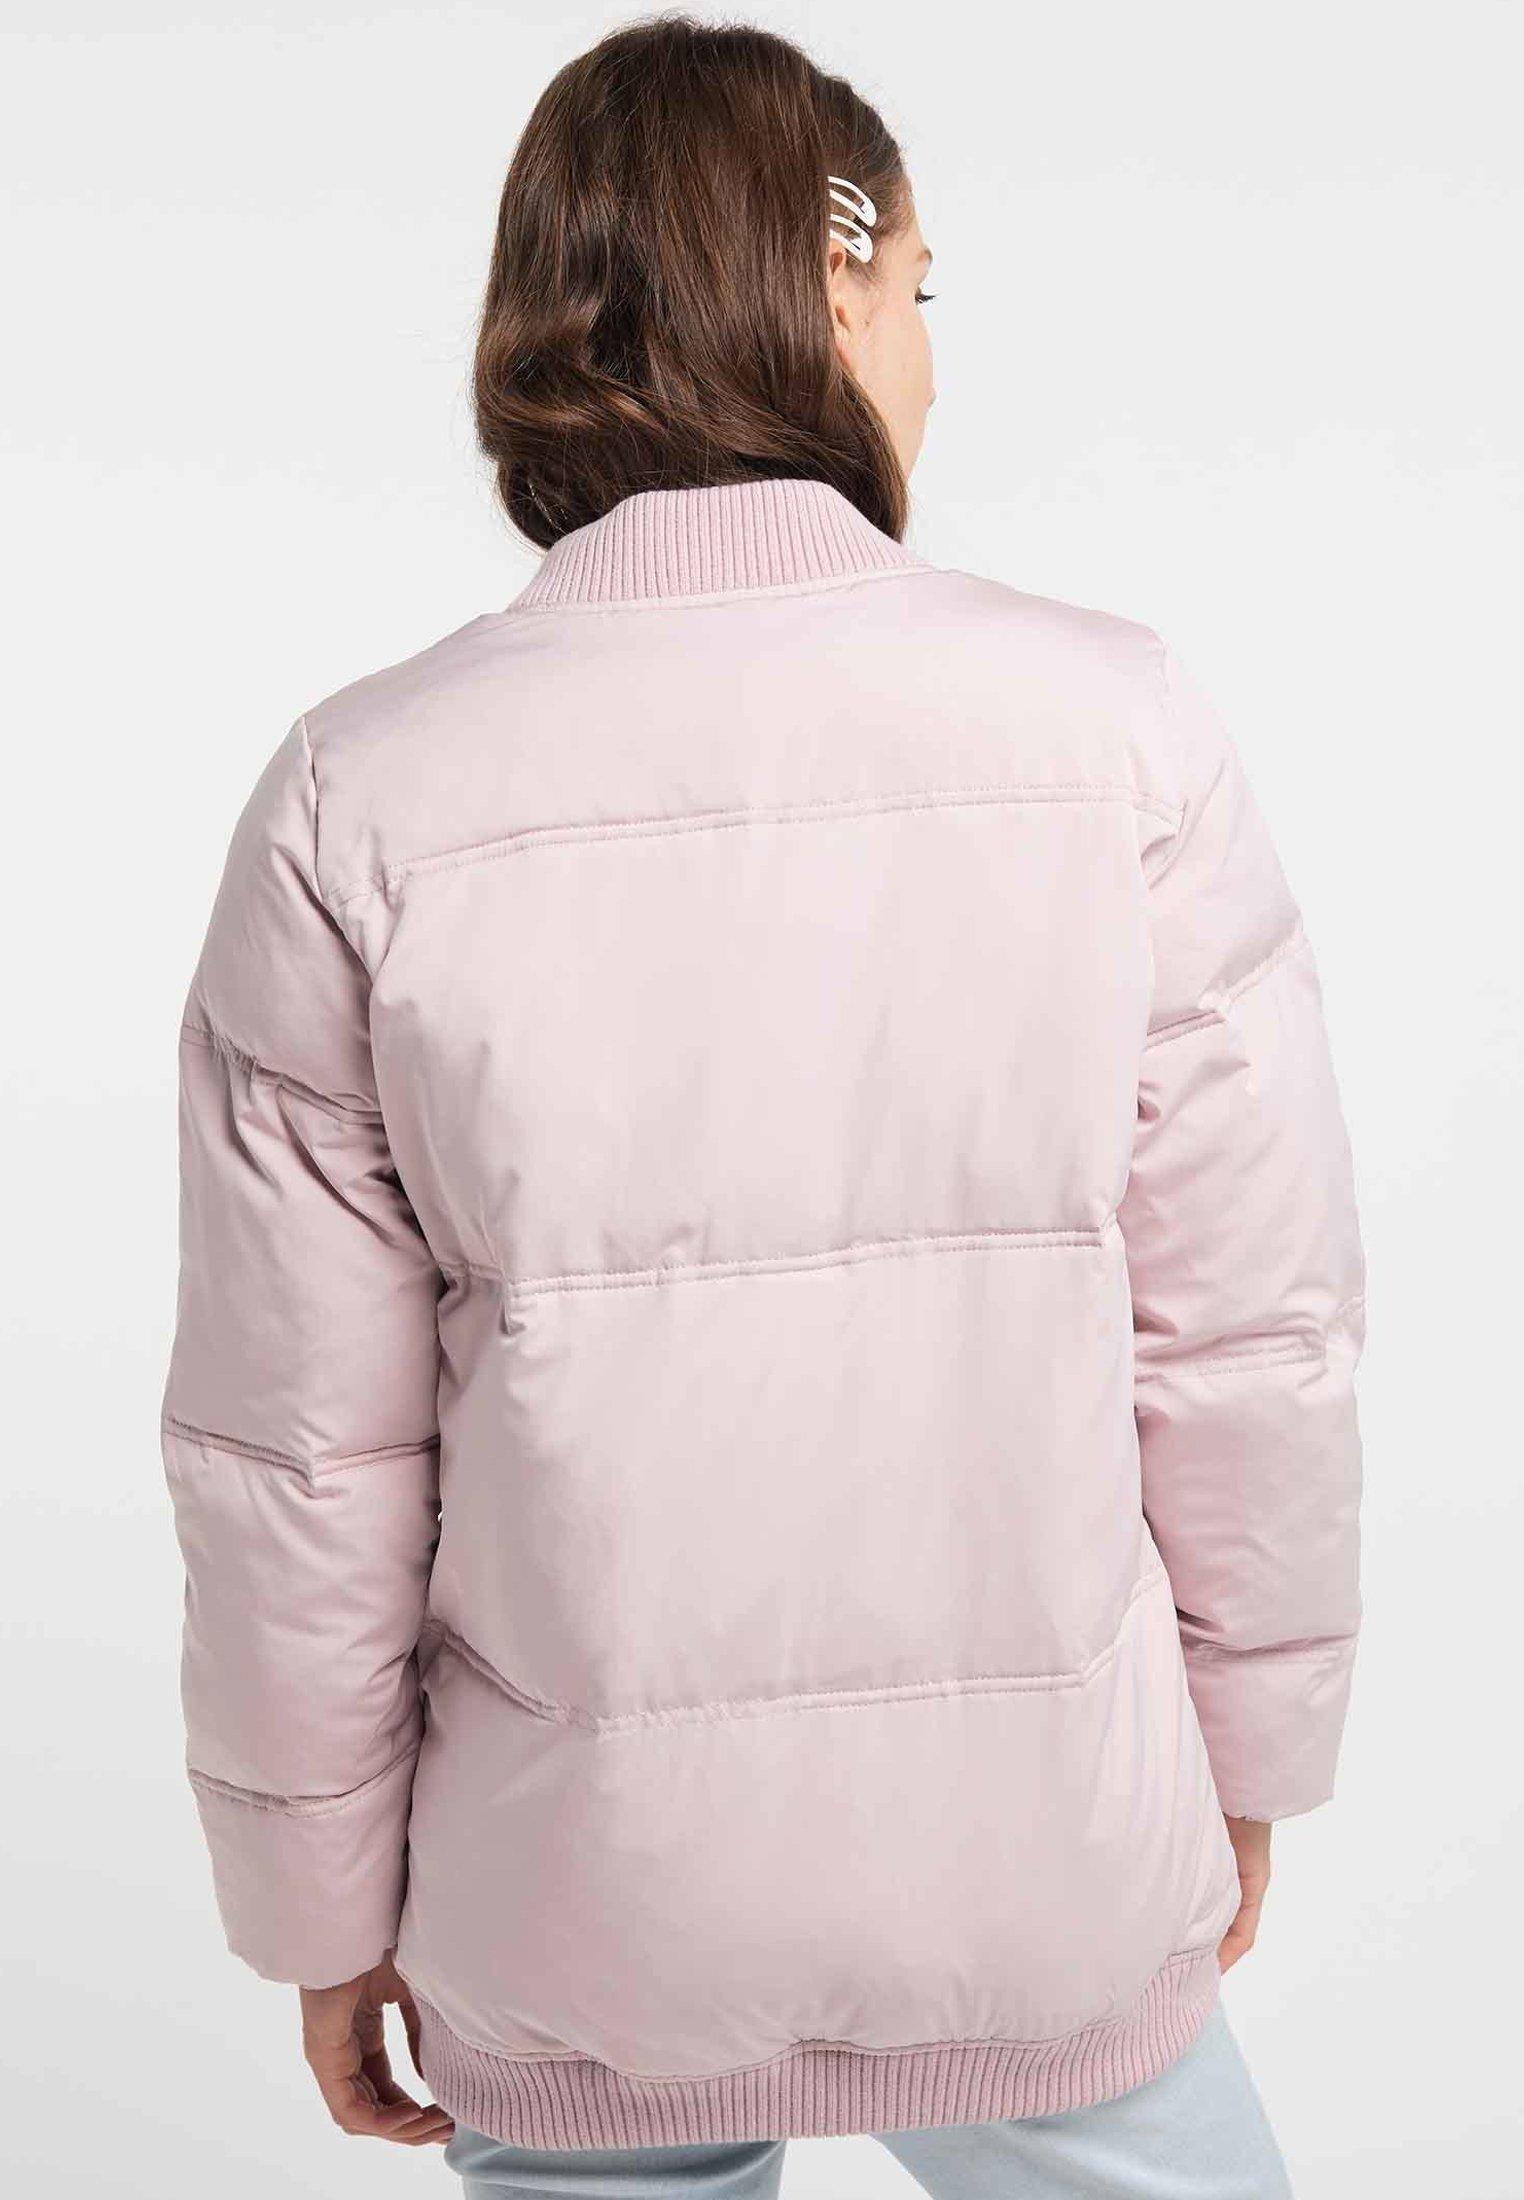 Collections Women's Clothing myMo Winter jacket powder pink DMliZ16AN